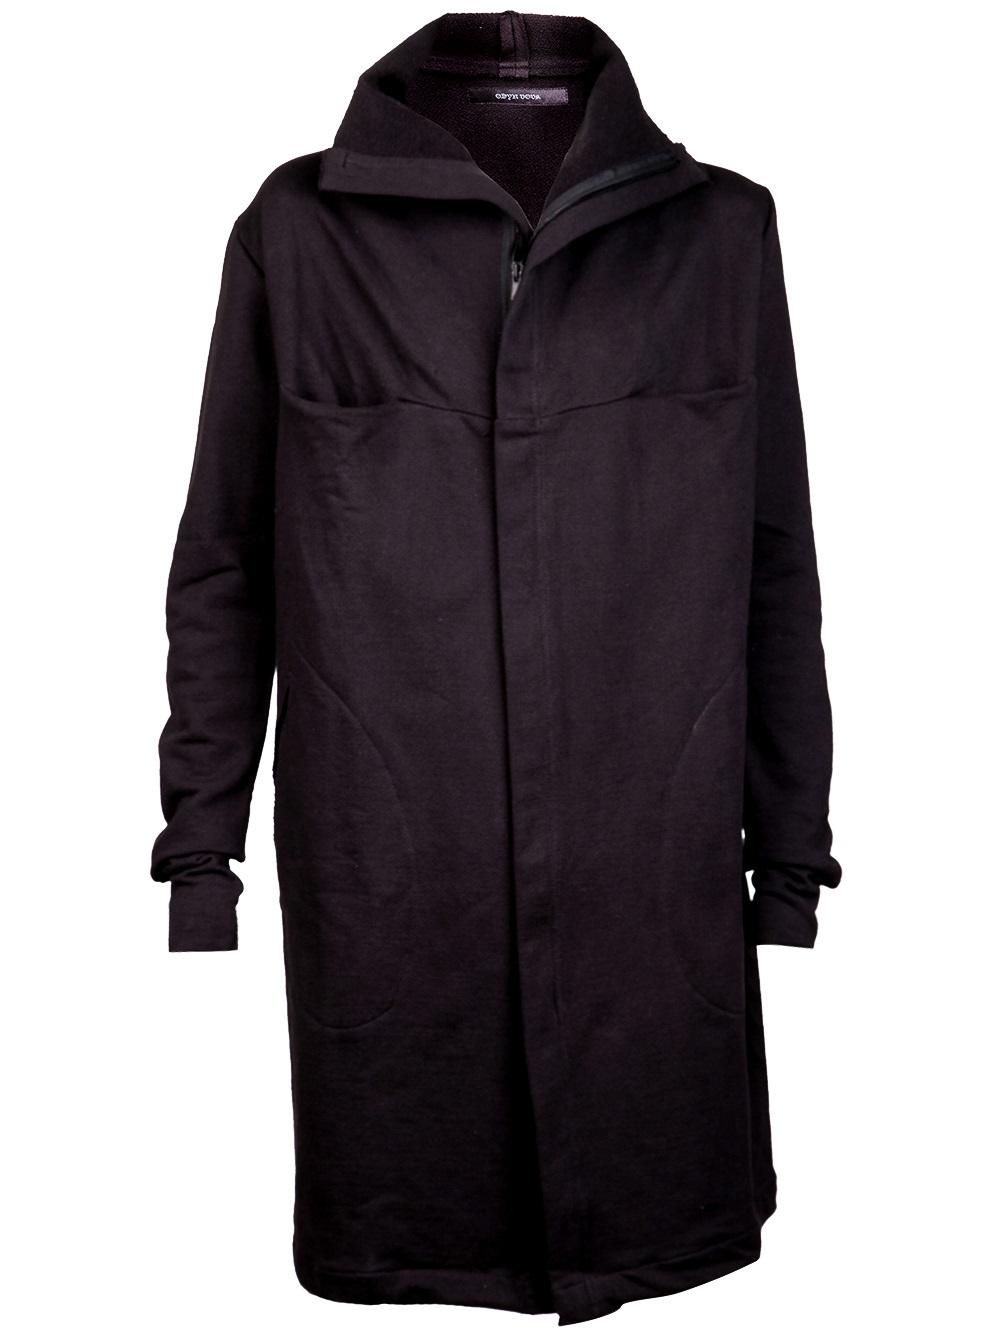 Odyn Vovk High Collar Invisible Coat In Black For Men Lyst